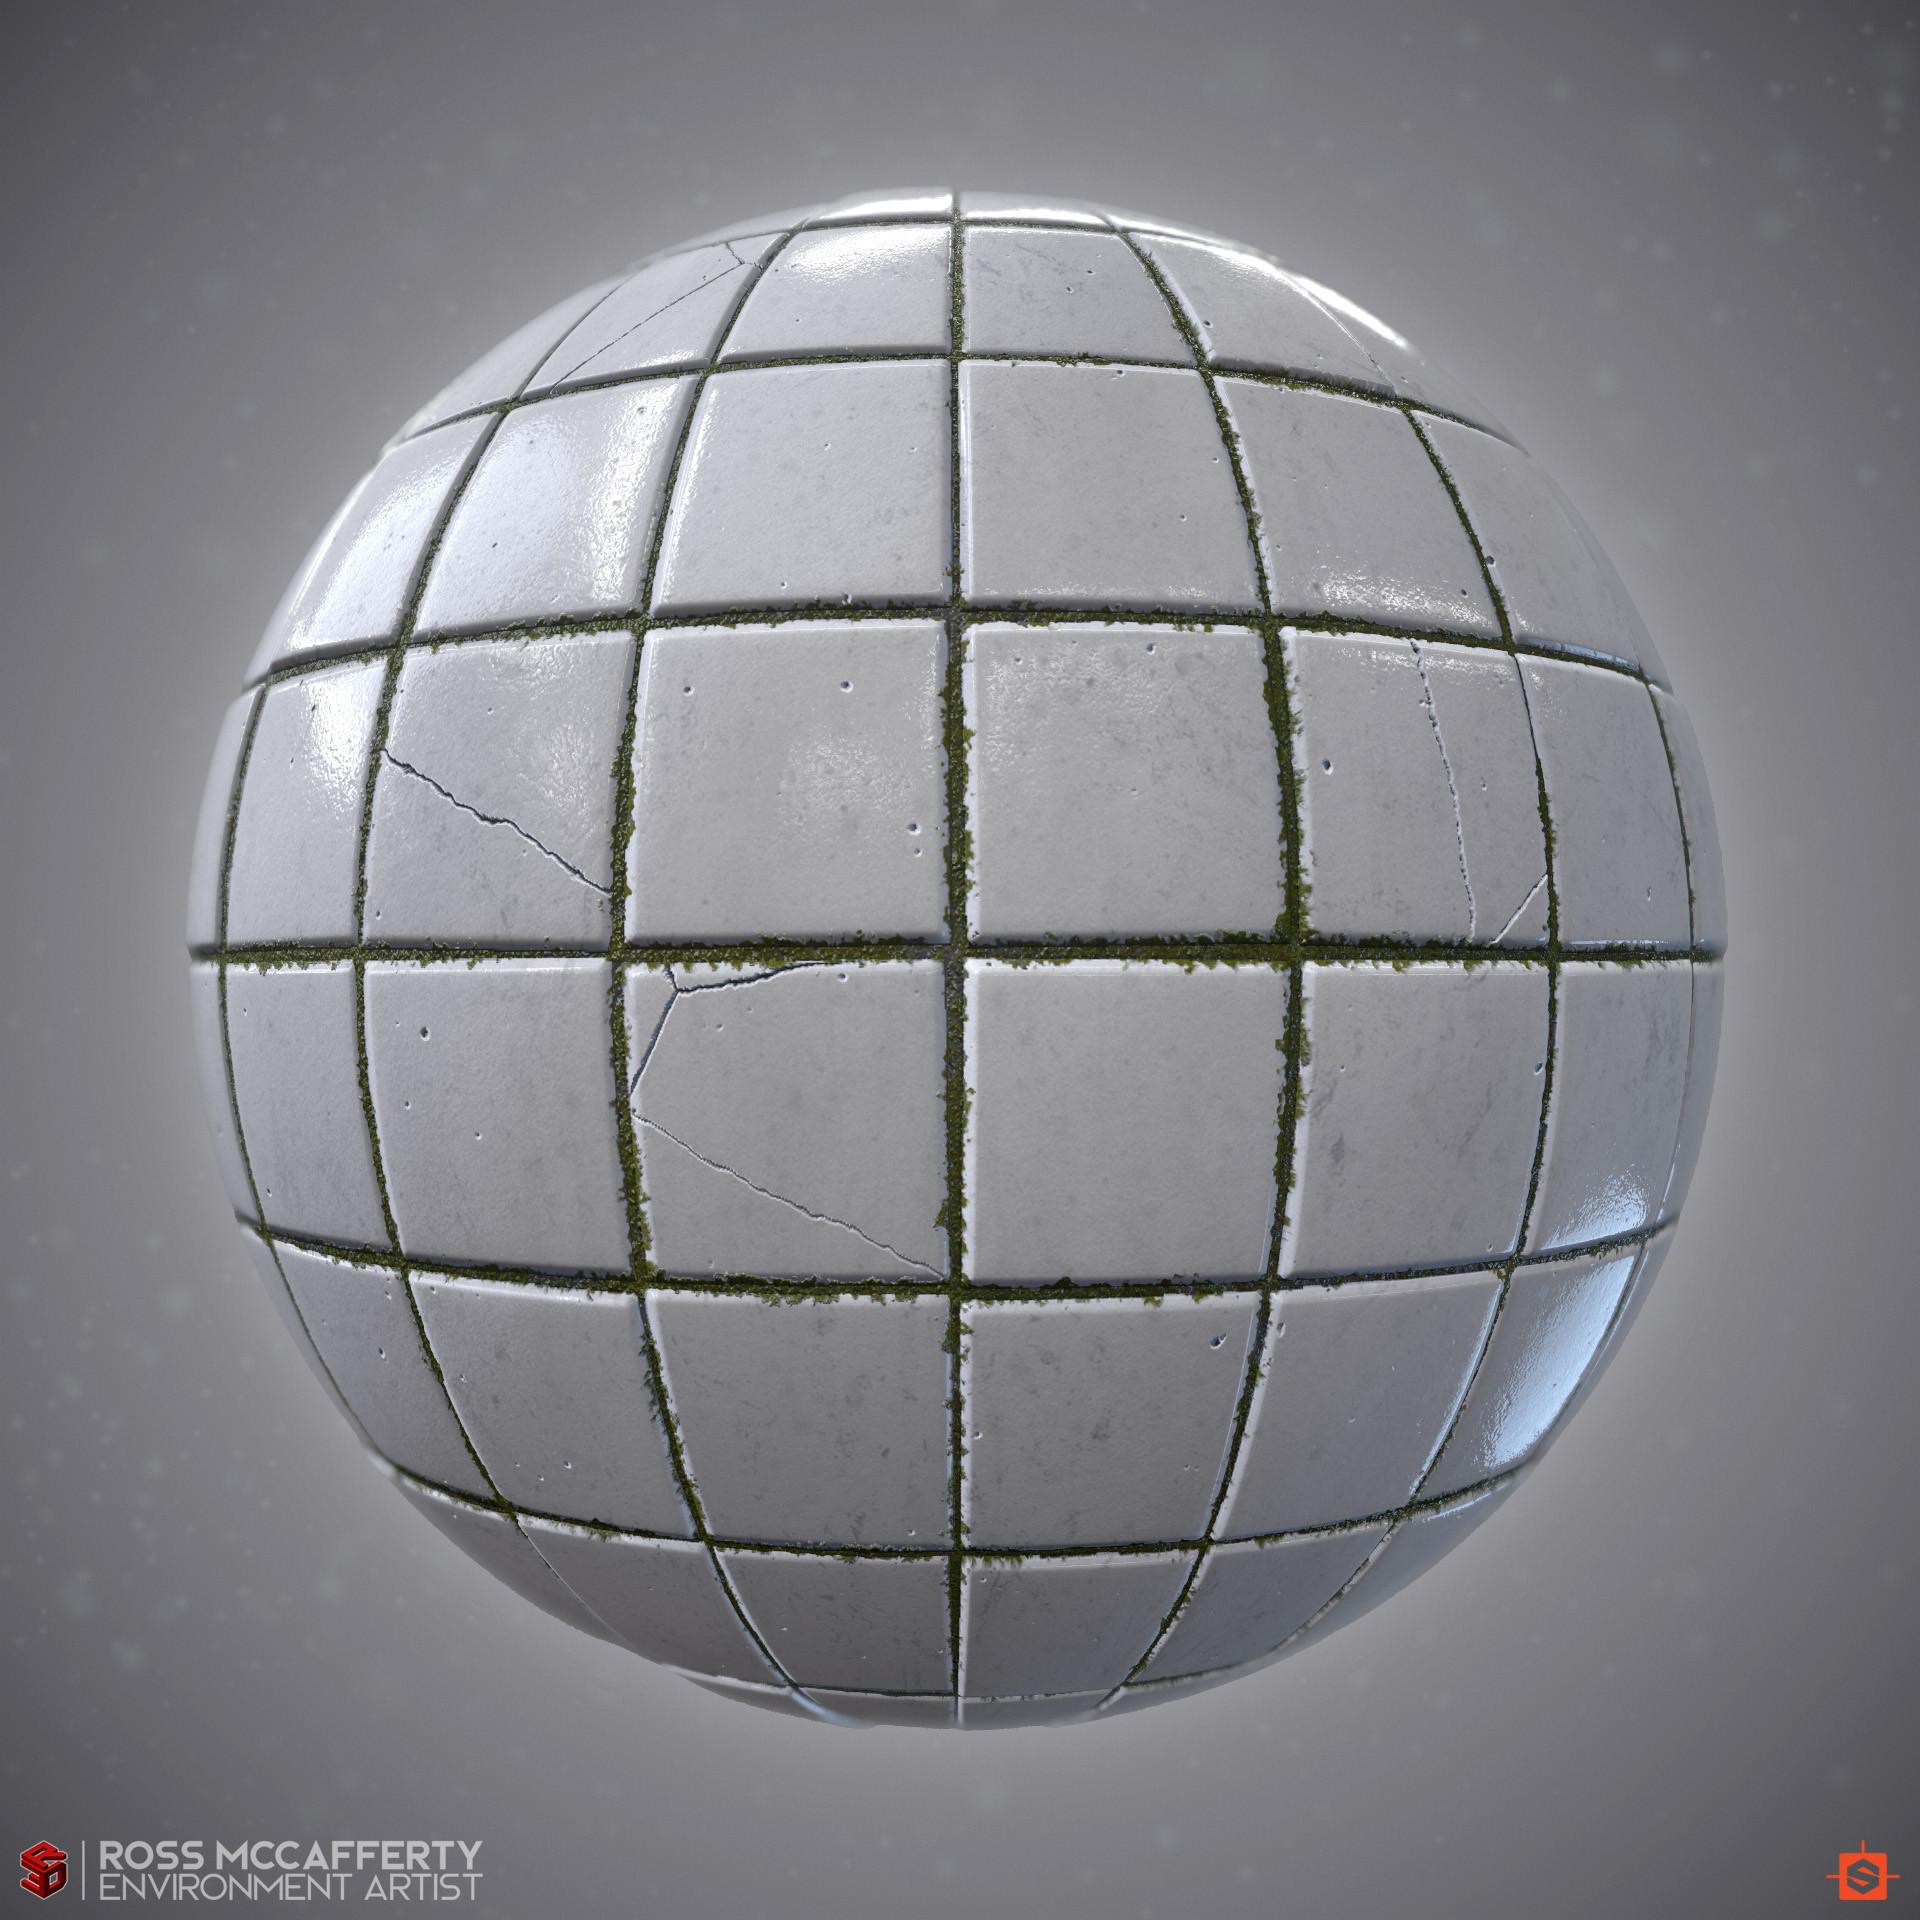 Ross mccafferty tiles 02